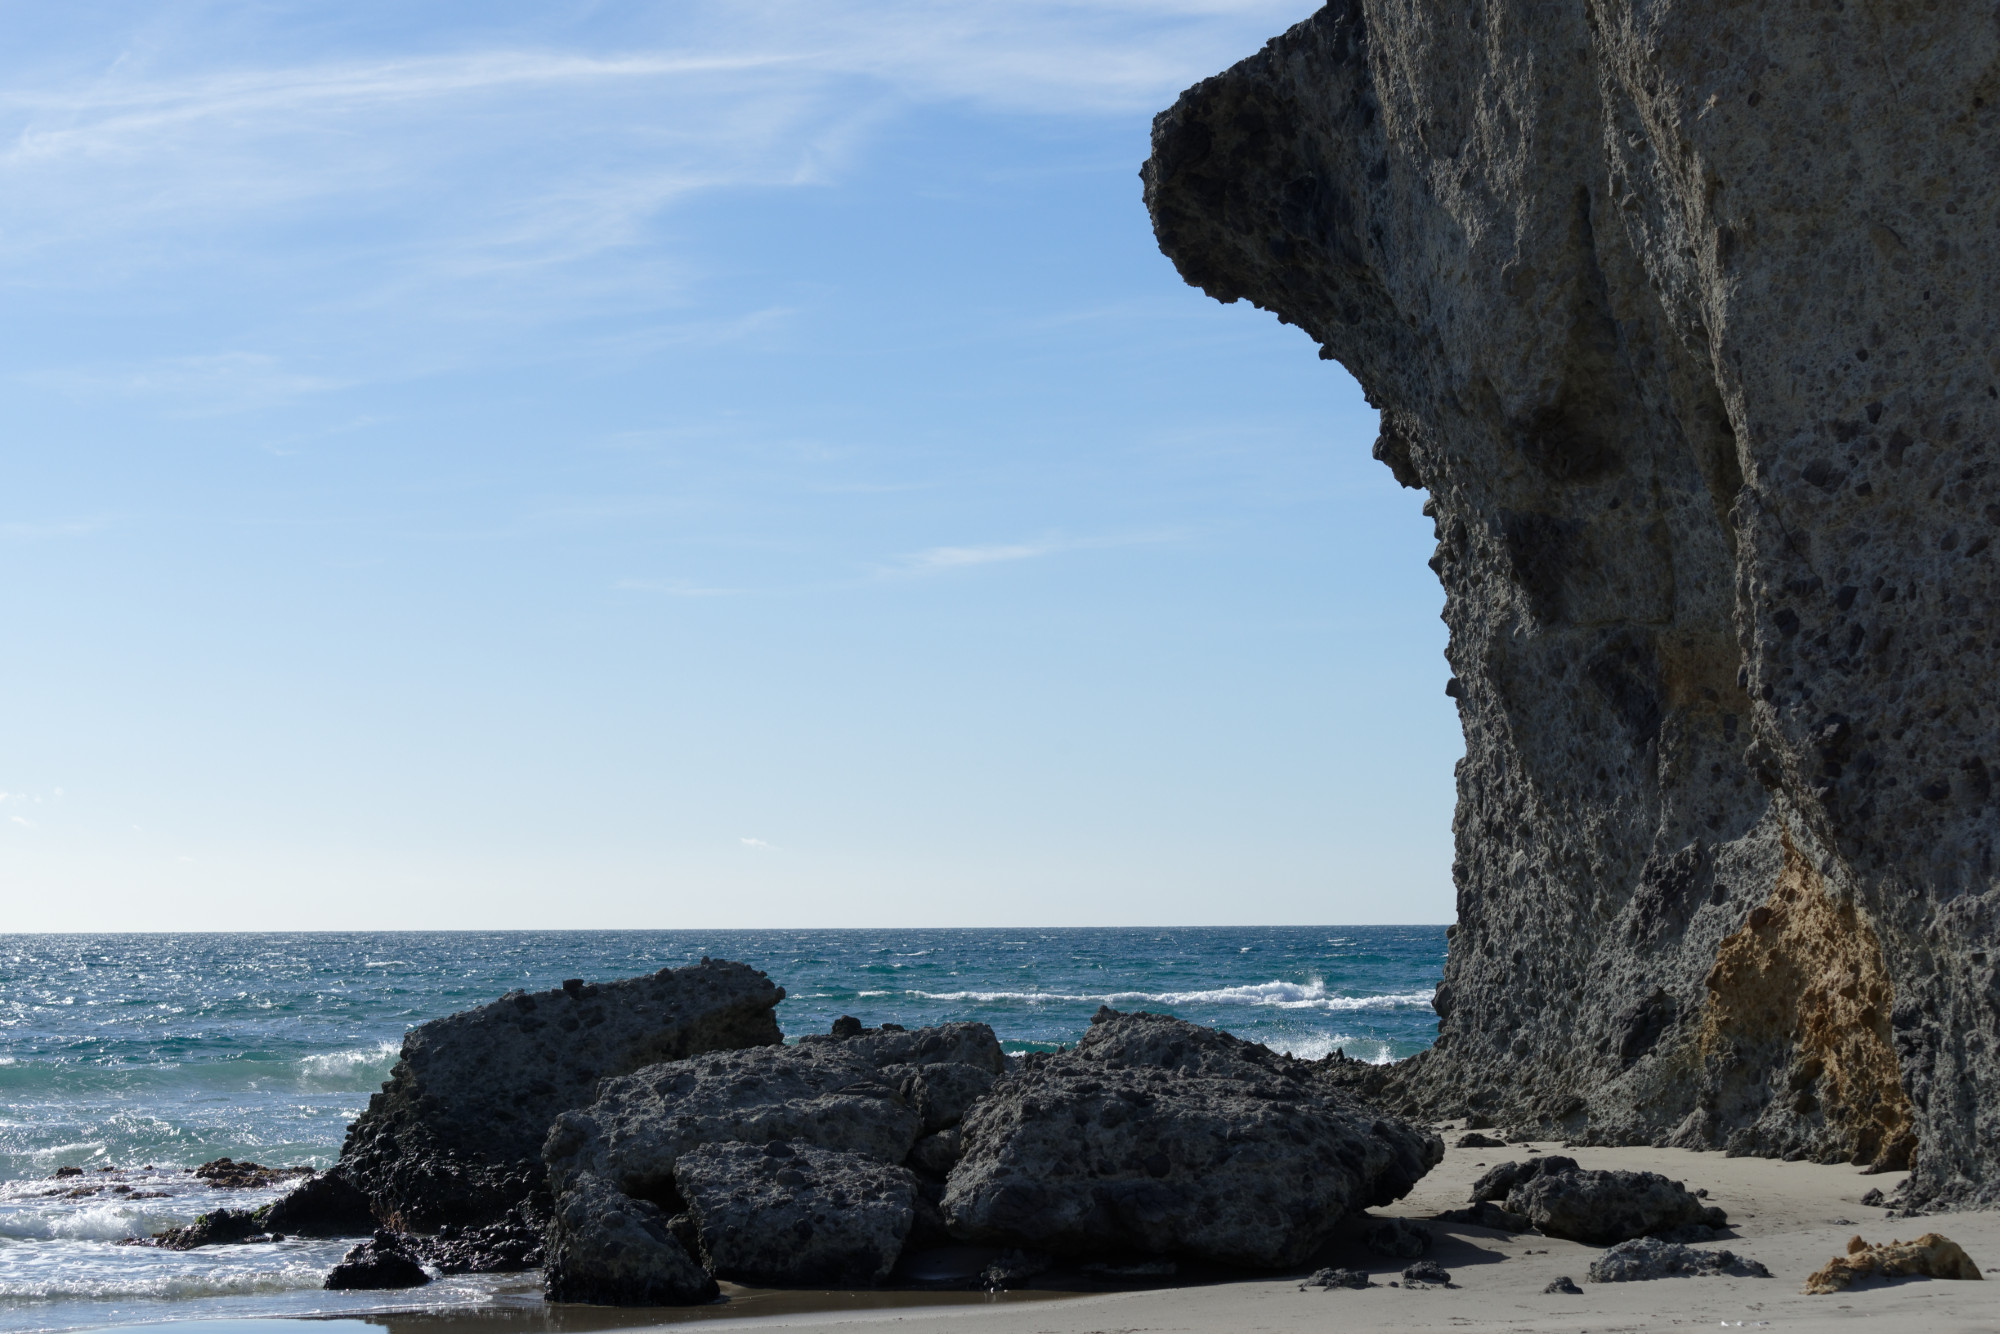 171214-San Jose-Playa del Monsul (Cabo de Gata-Andalousie) (164)